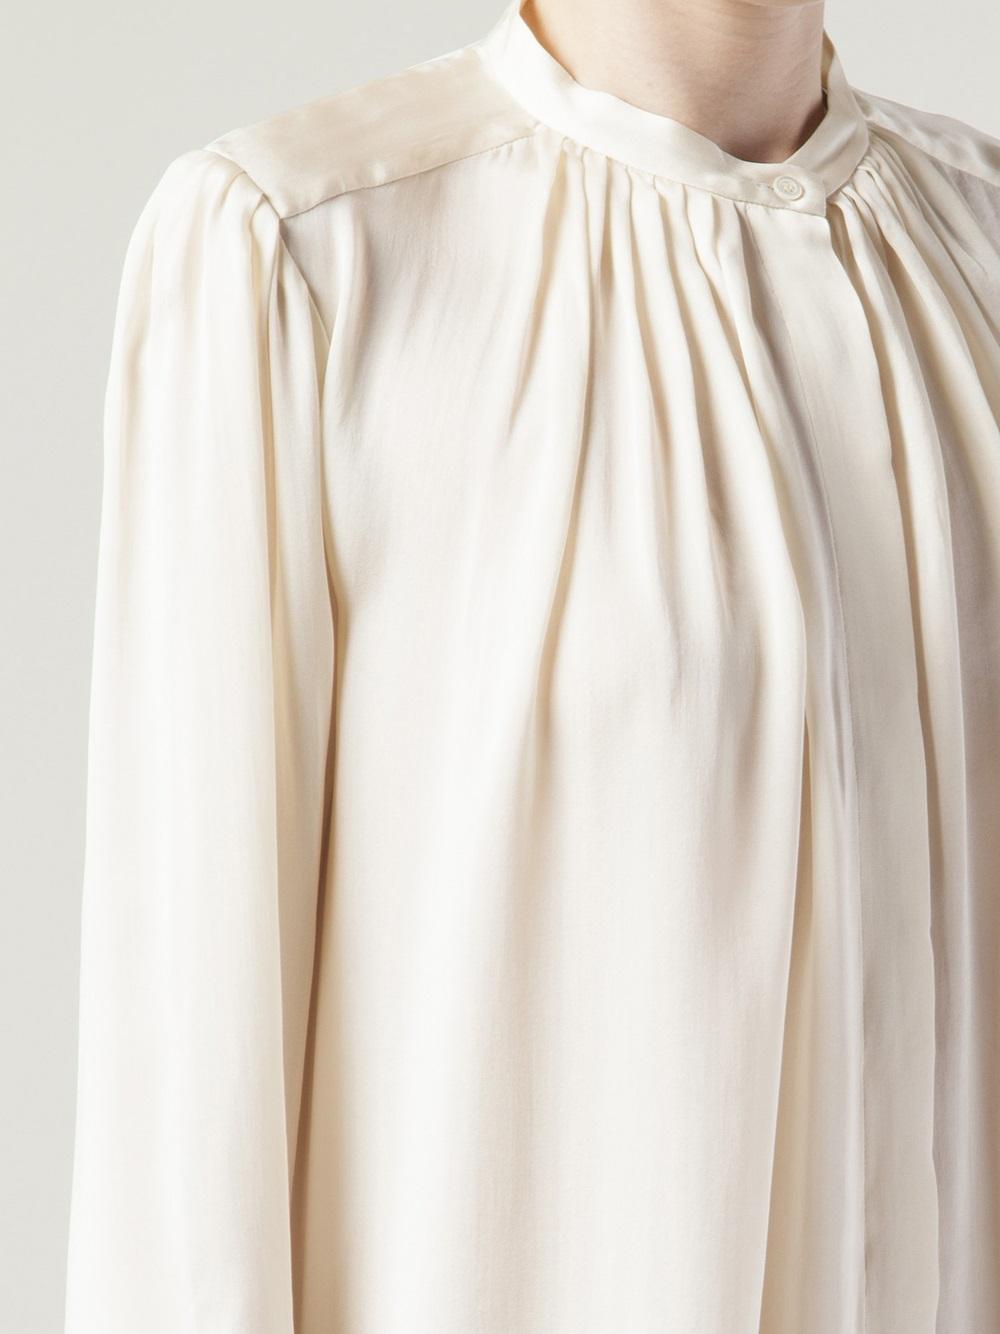 Long White Blouse Tunic